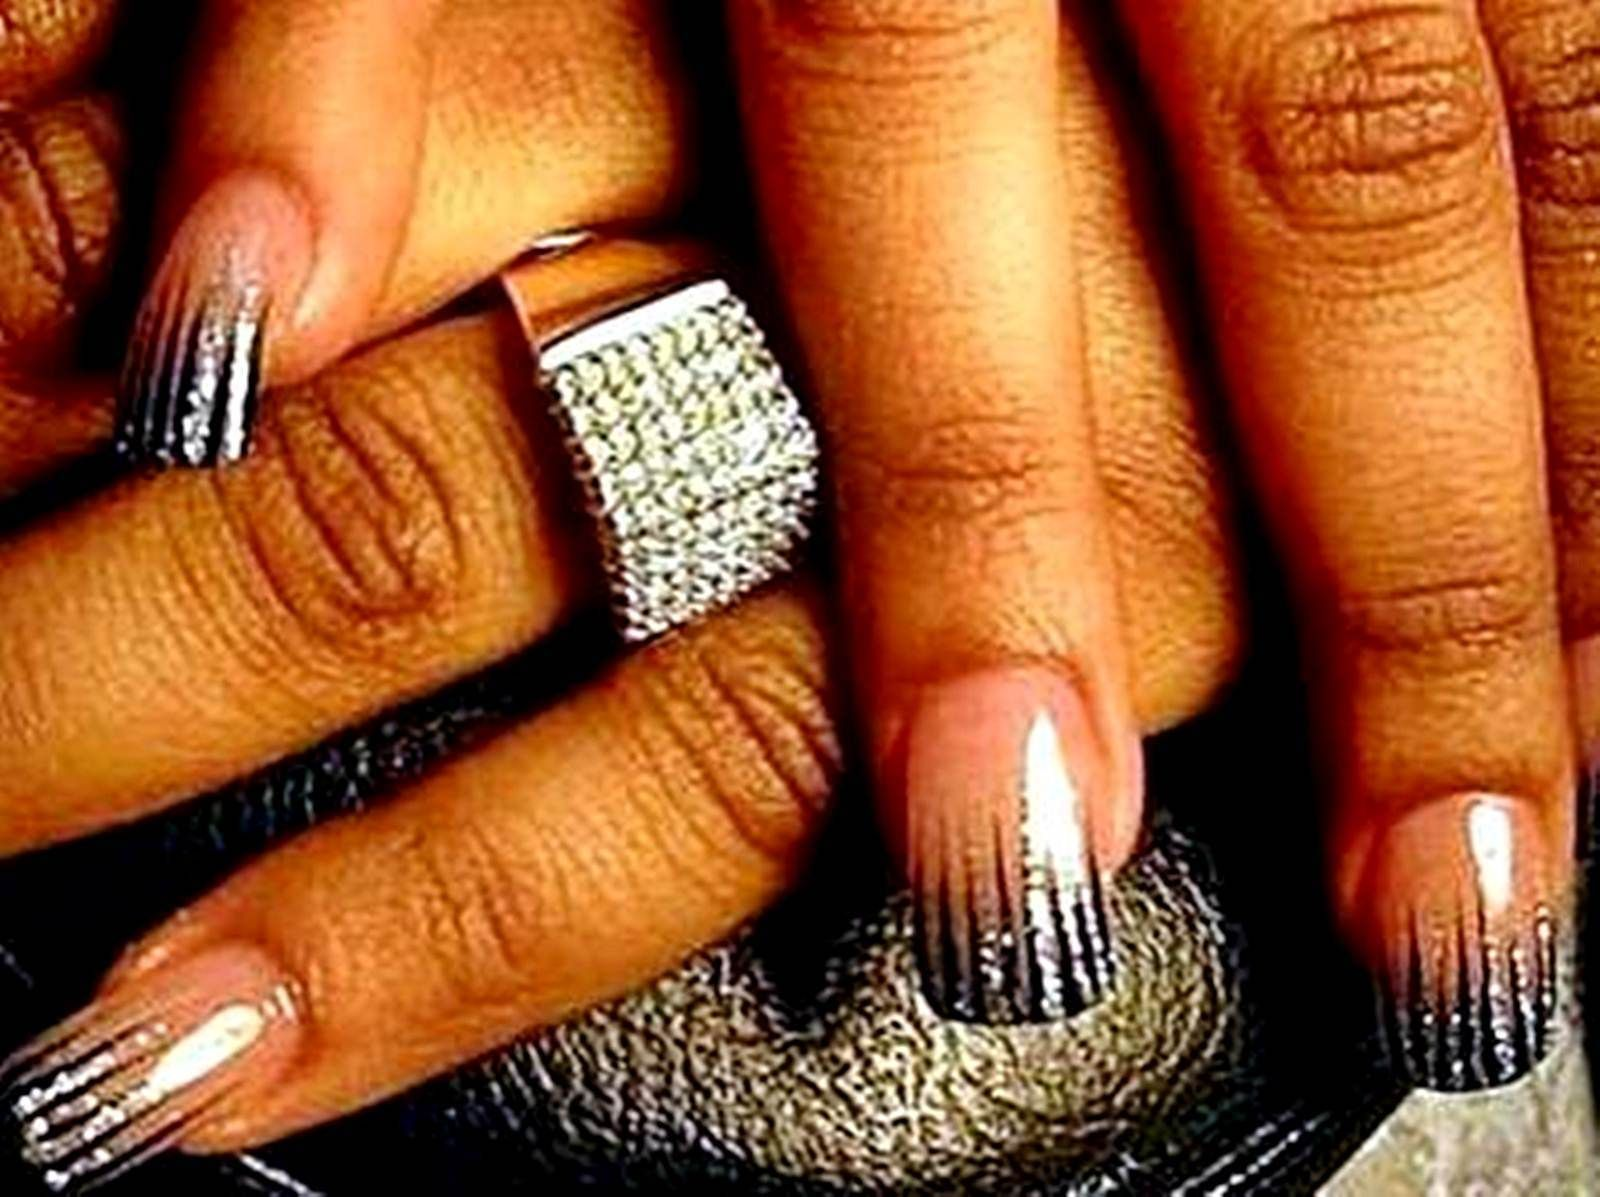 Gel Nail Designs With Glitter Black Glitter Gel Nails Designs 2011